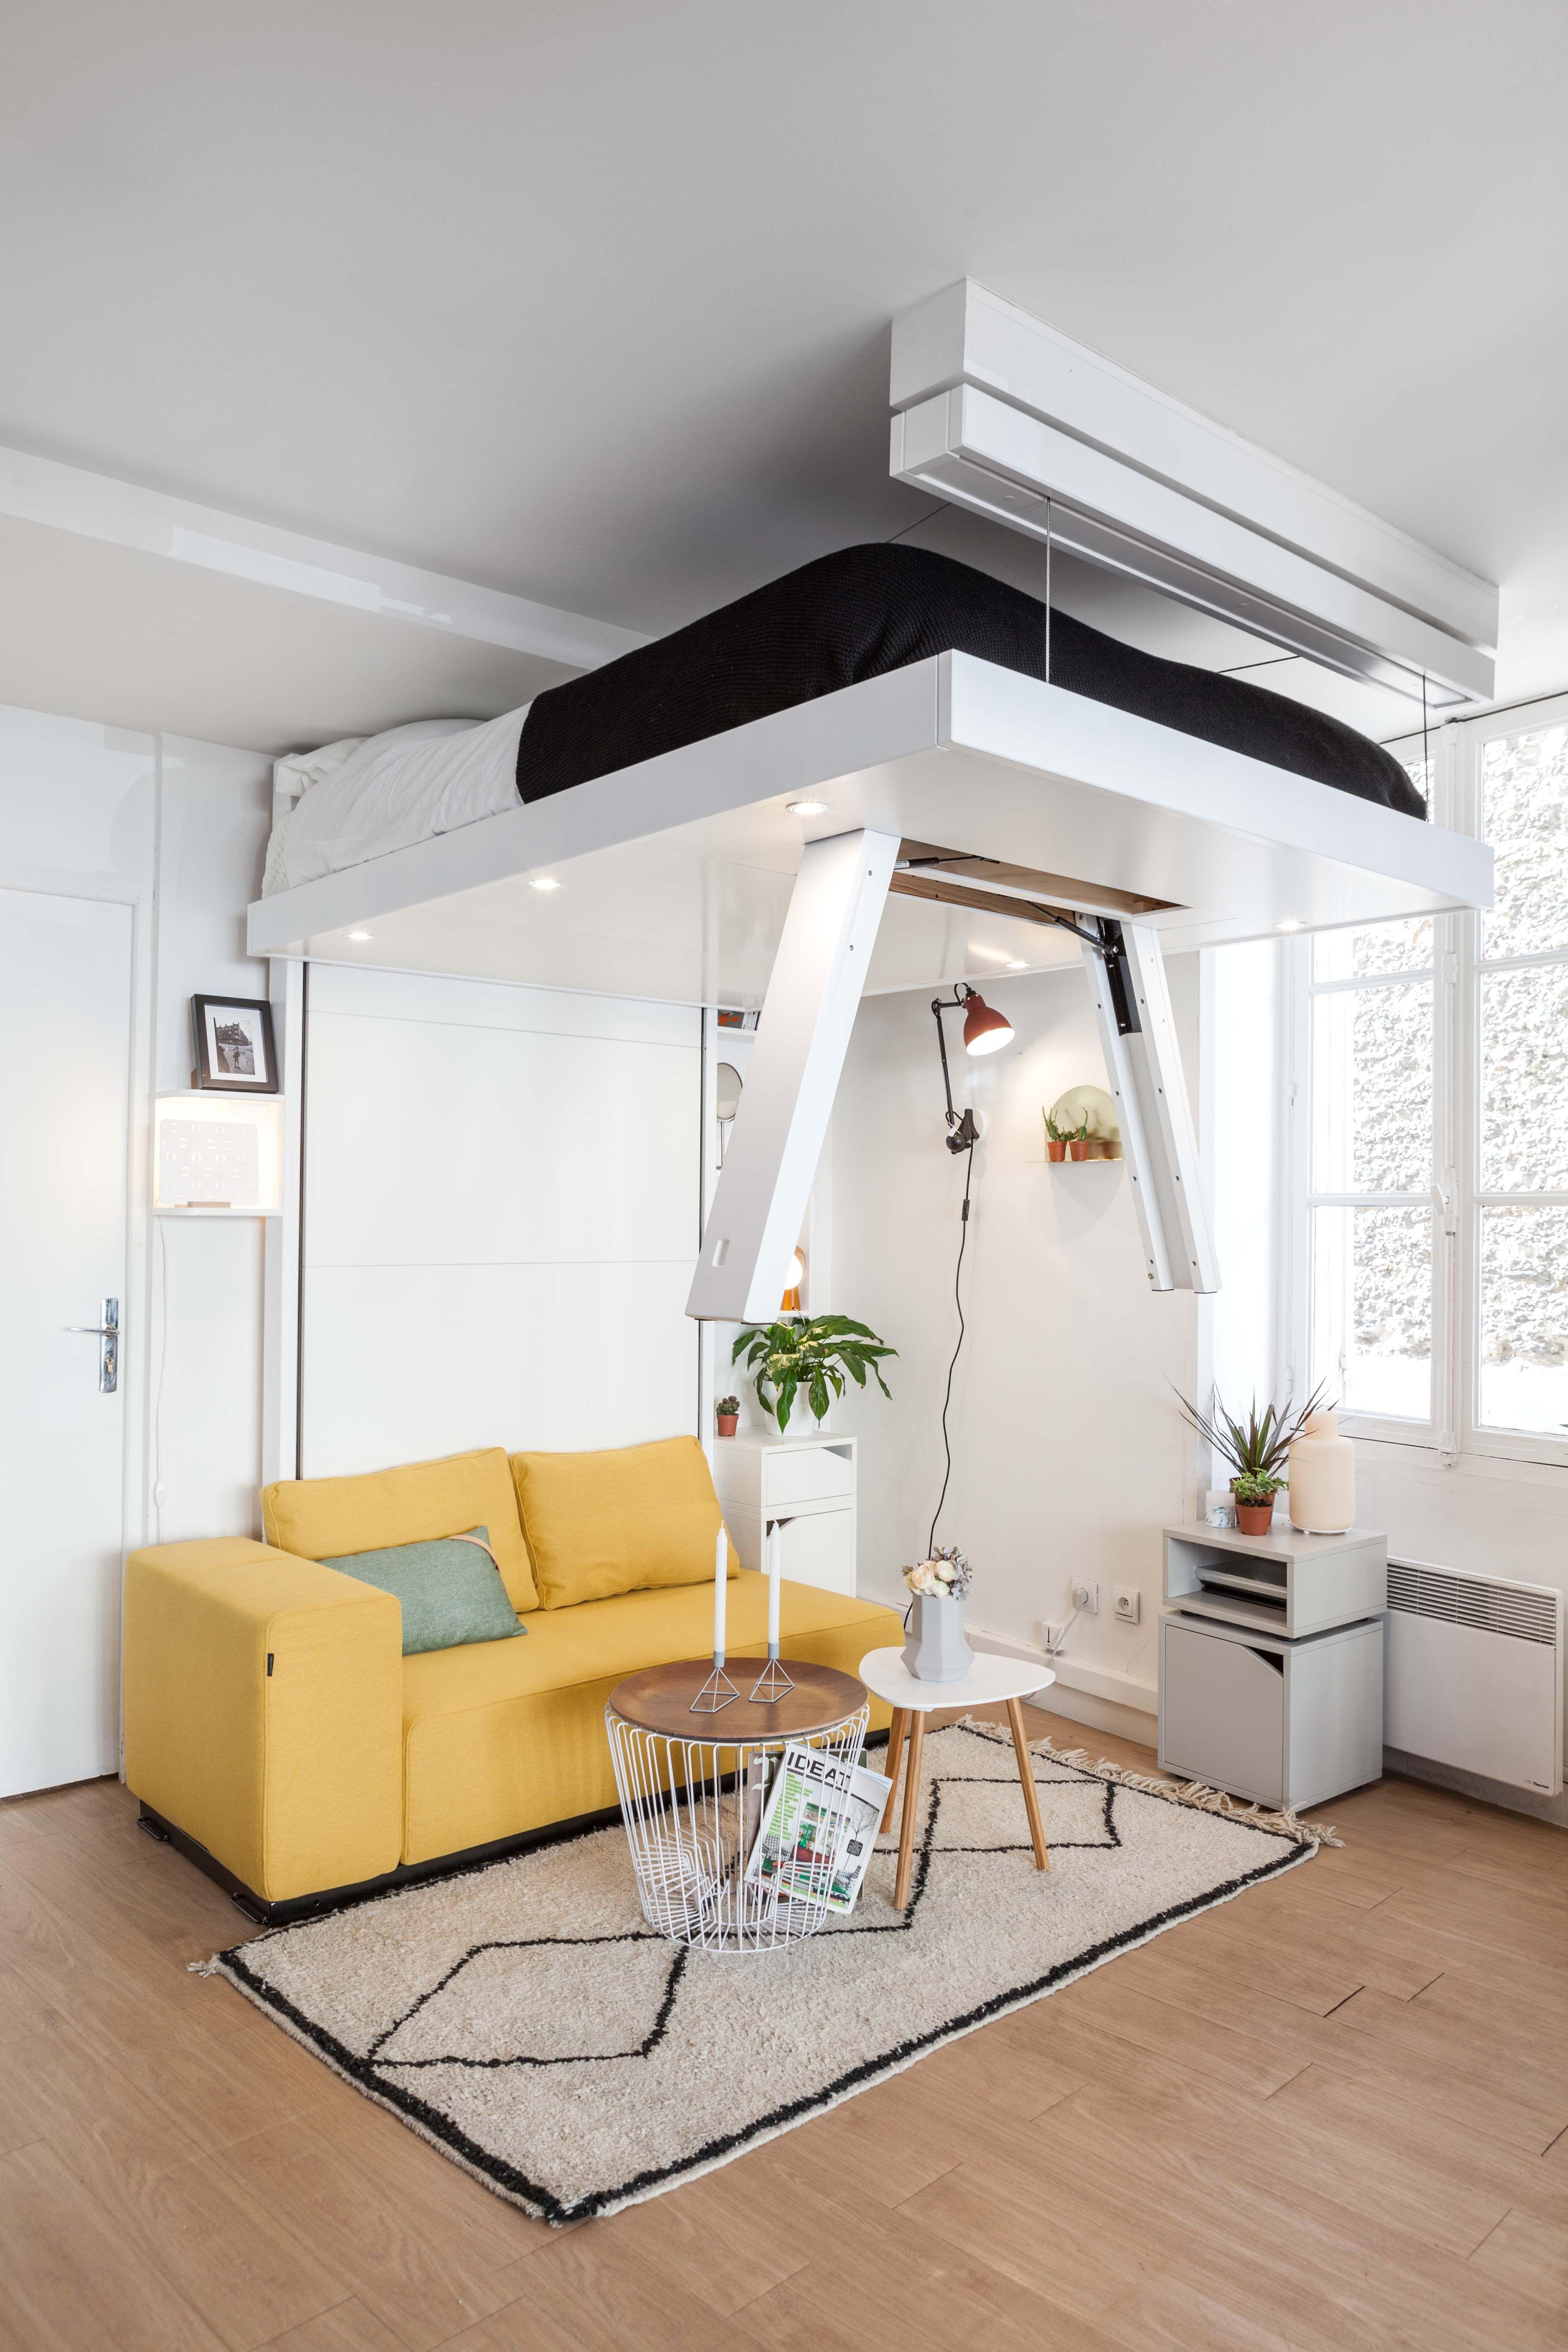 bedup litsuspendu gaindespace smallspace interior. Black Bedroom Furniture Sets. Home Design Ideas